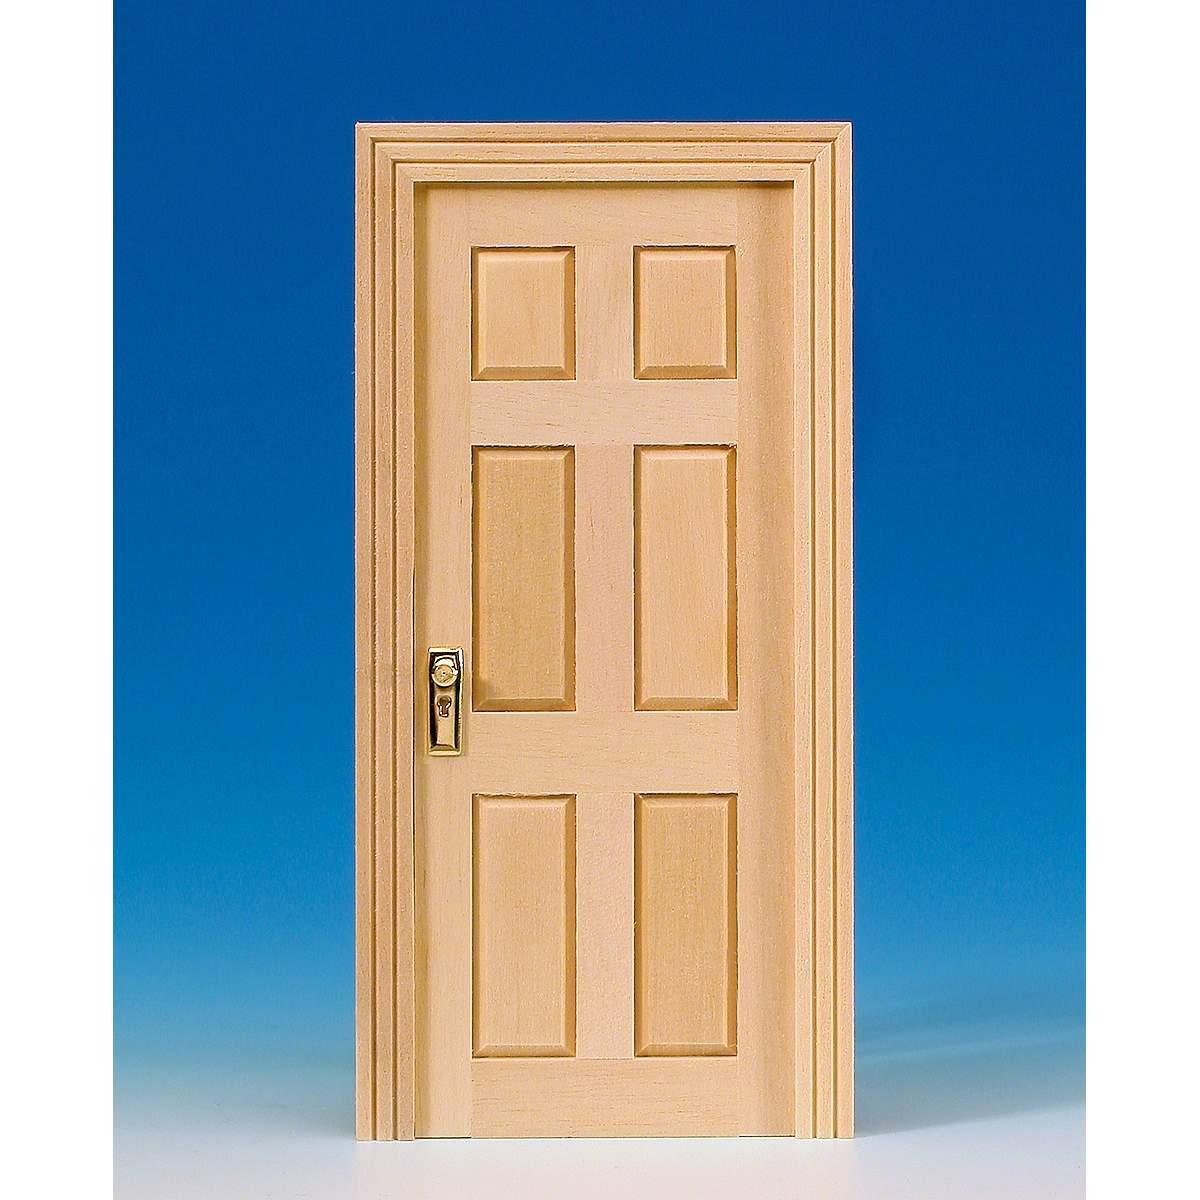 t r attrappe ideal f r die modul box 60310. Black Bedroom Furniture Sets. Home Design Ideas